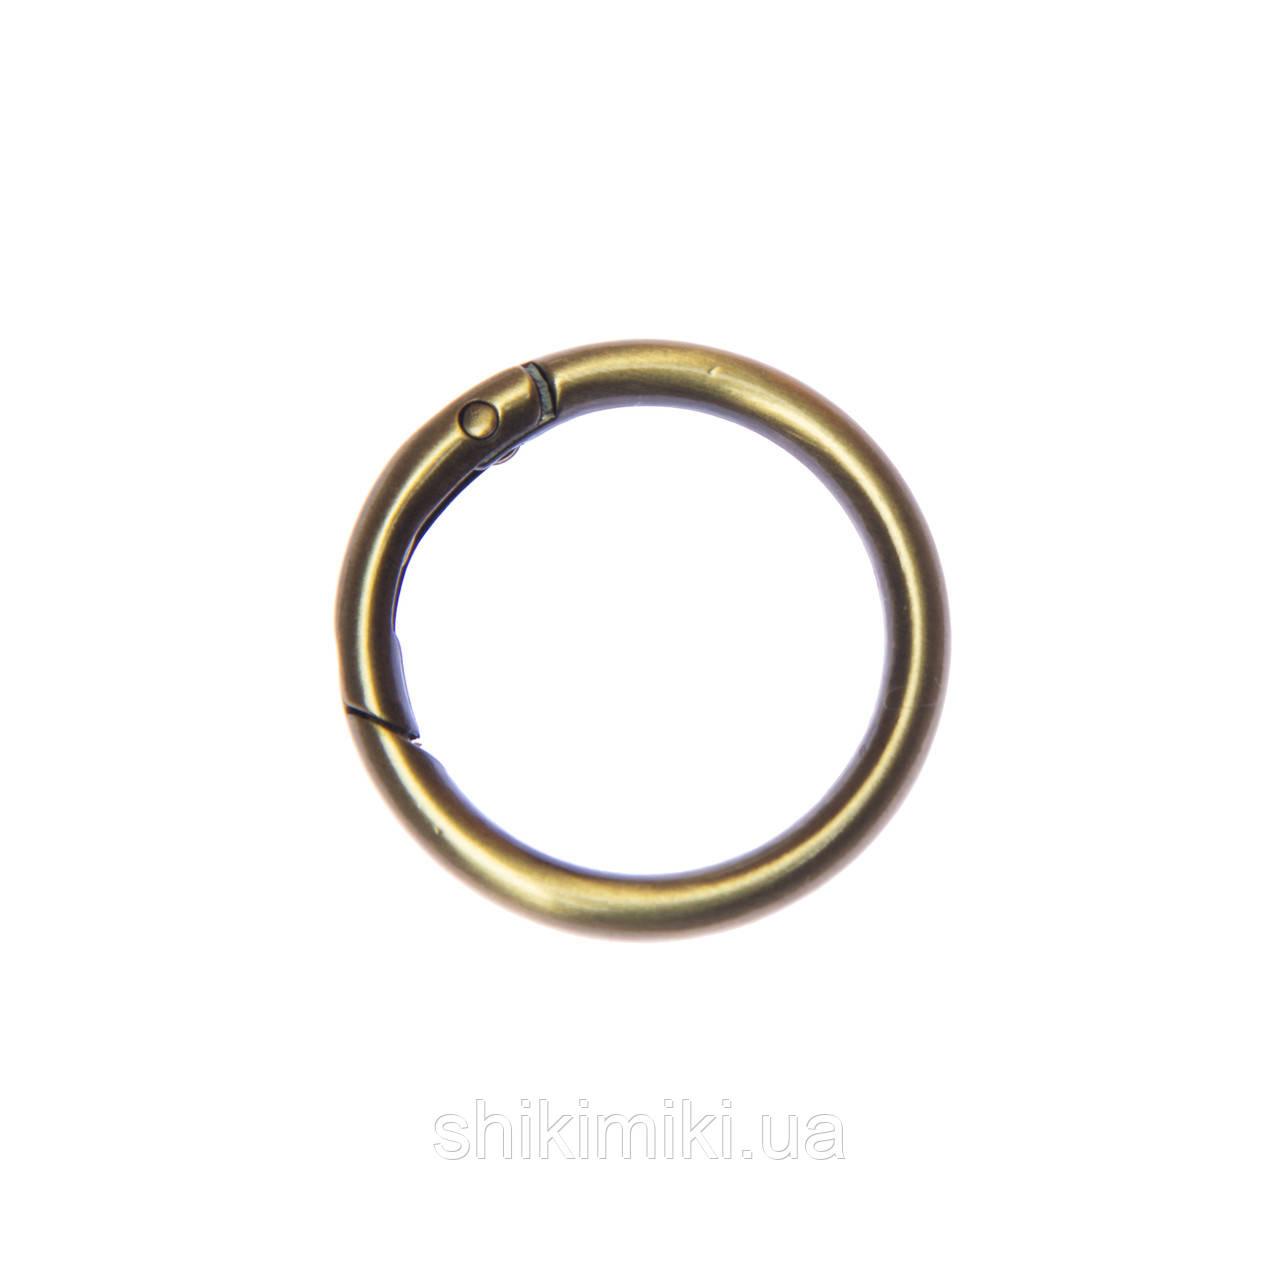 Кольцо-карабин KK03-44 (30 мм), цвет антик